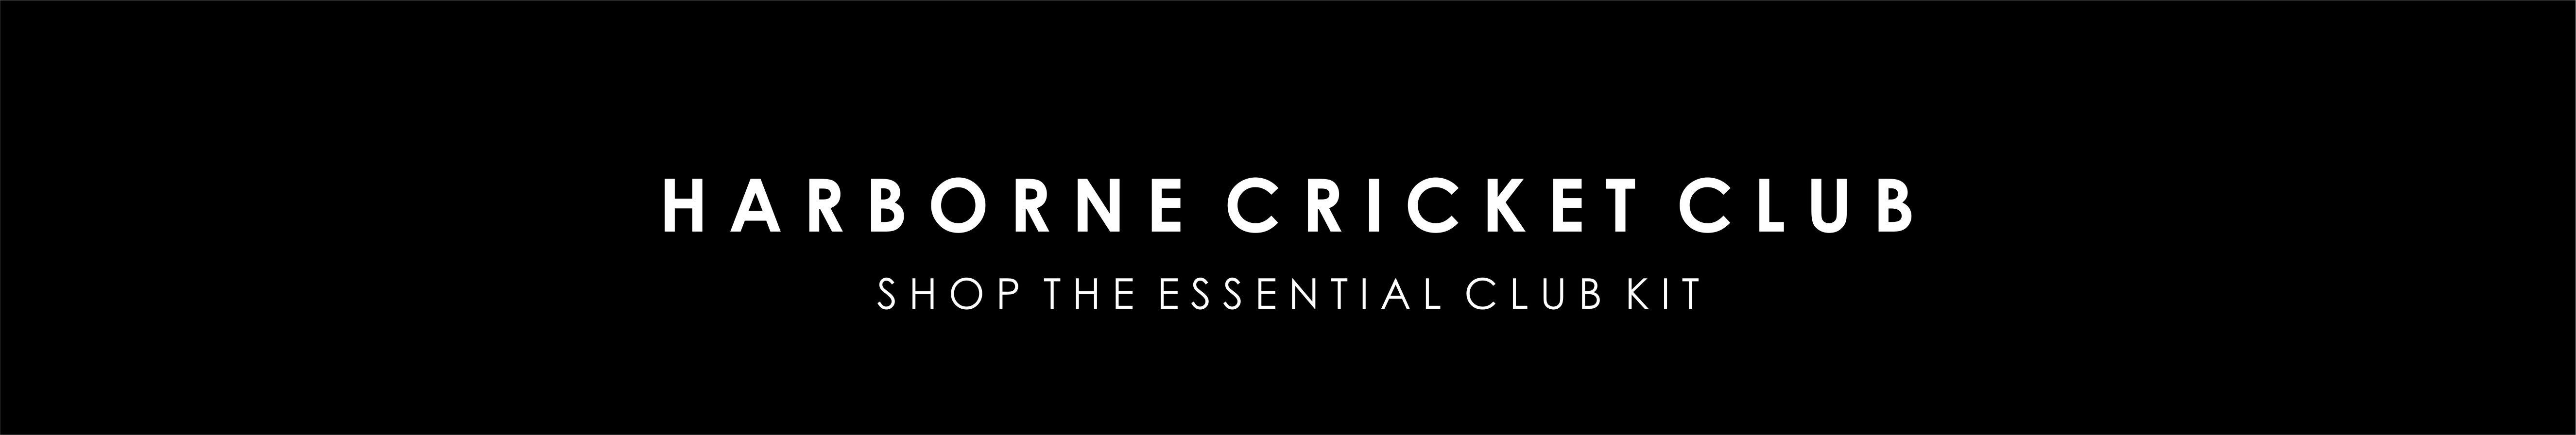 harborne-cricket-banner.jpg